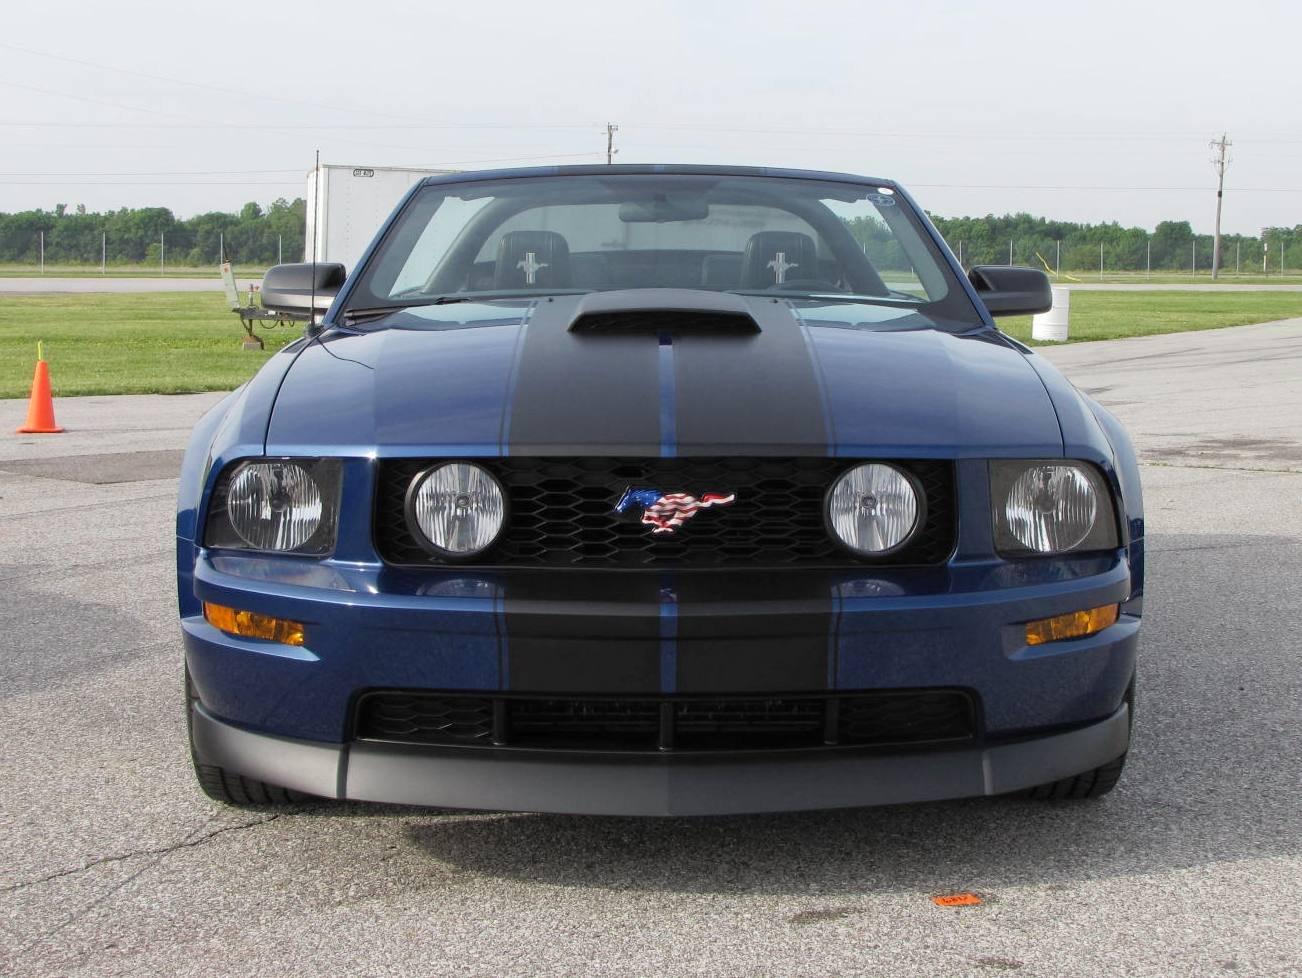 2007 Mustang vista blue with gloss black or matte black stripes